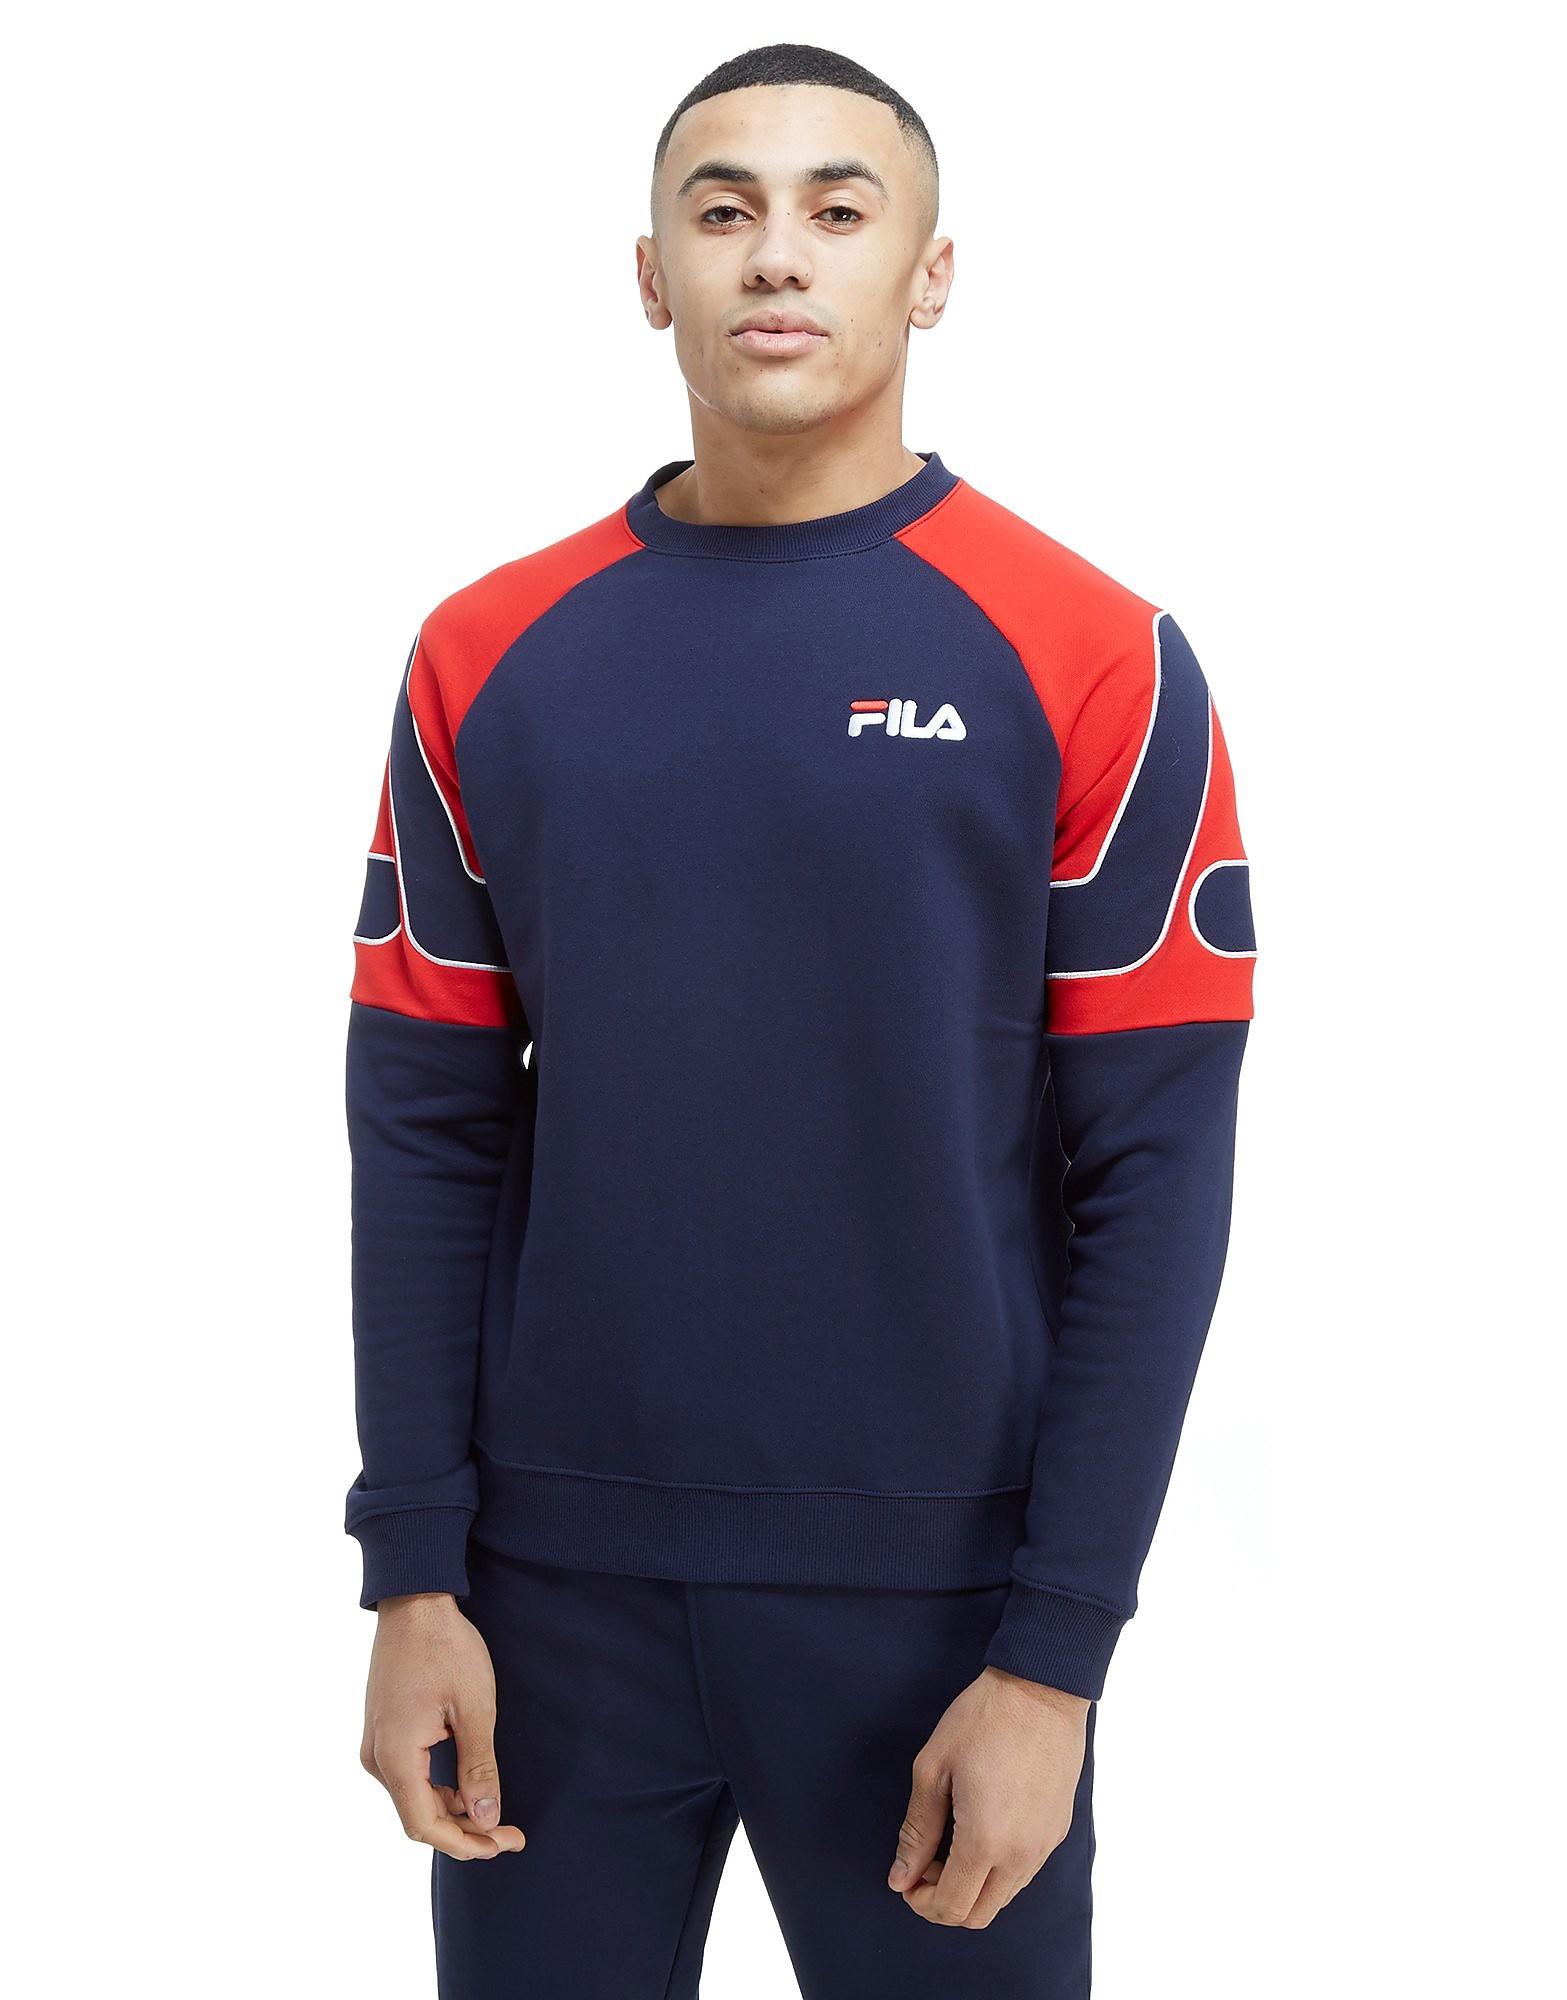 Fila Aria Crew Sweatshirt